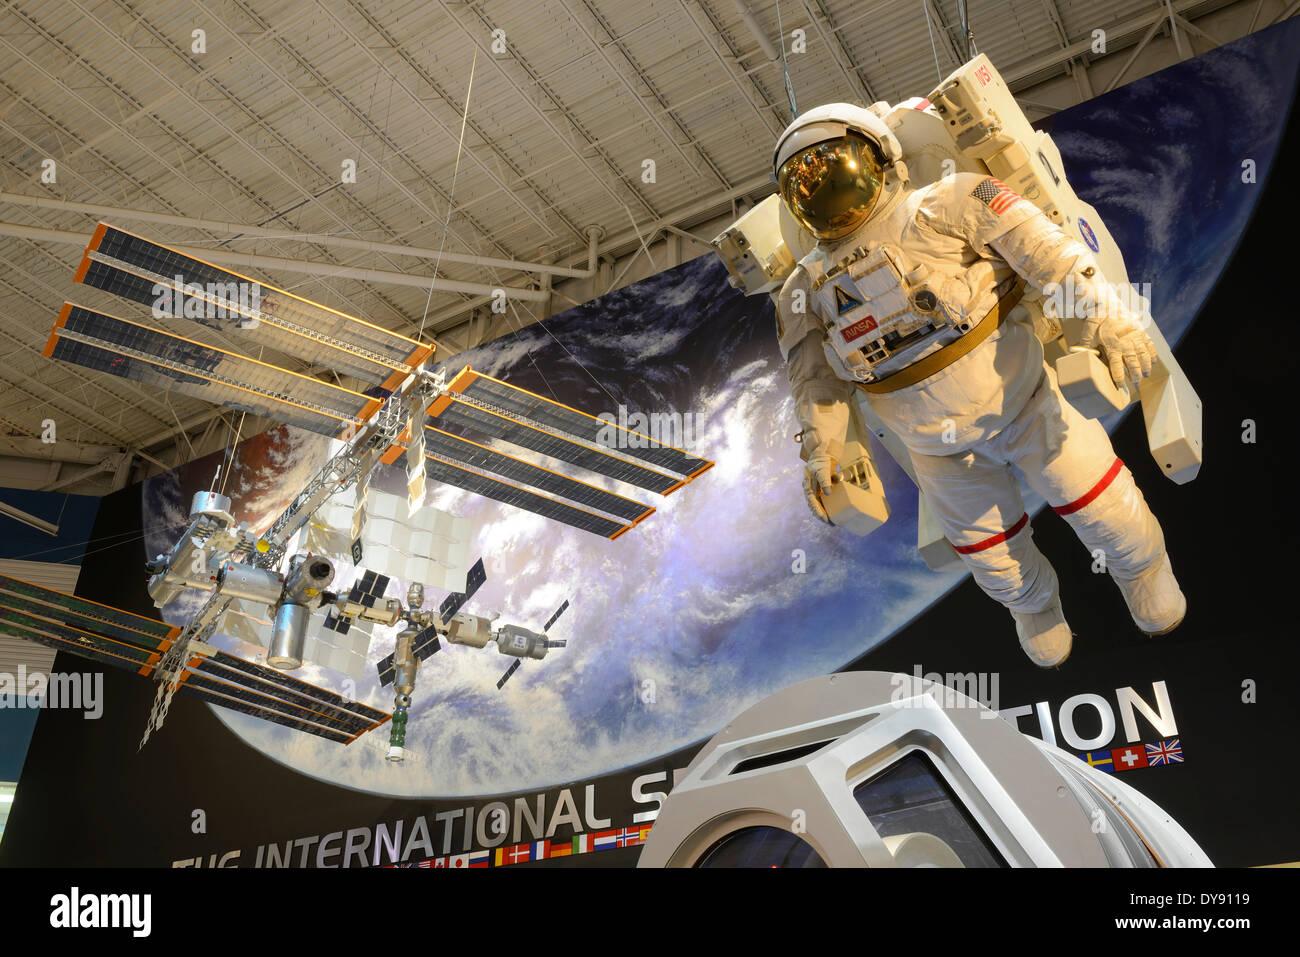 USA, United States, America, Texas, Houston, NASA, Space Center, Astronaut, ISS - Stock Image